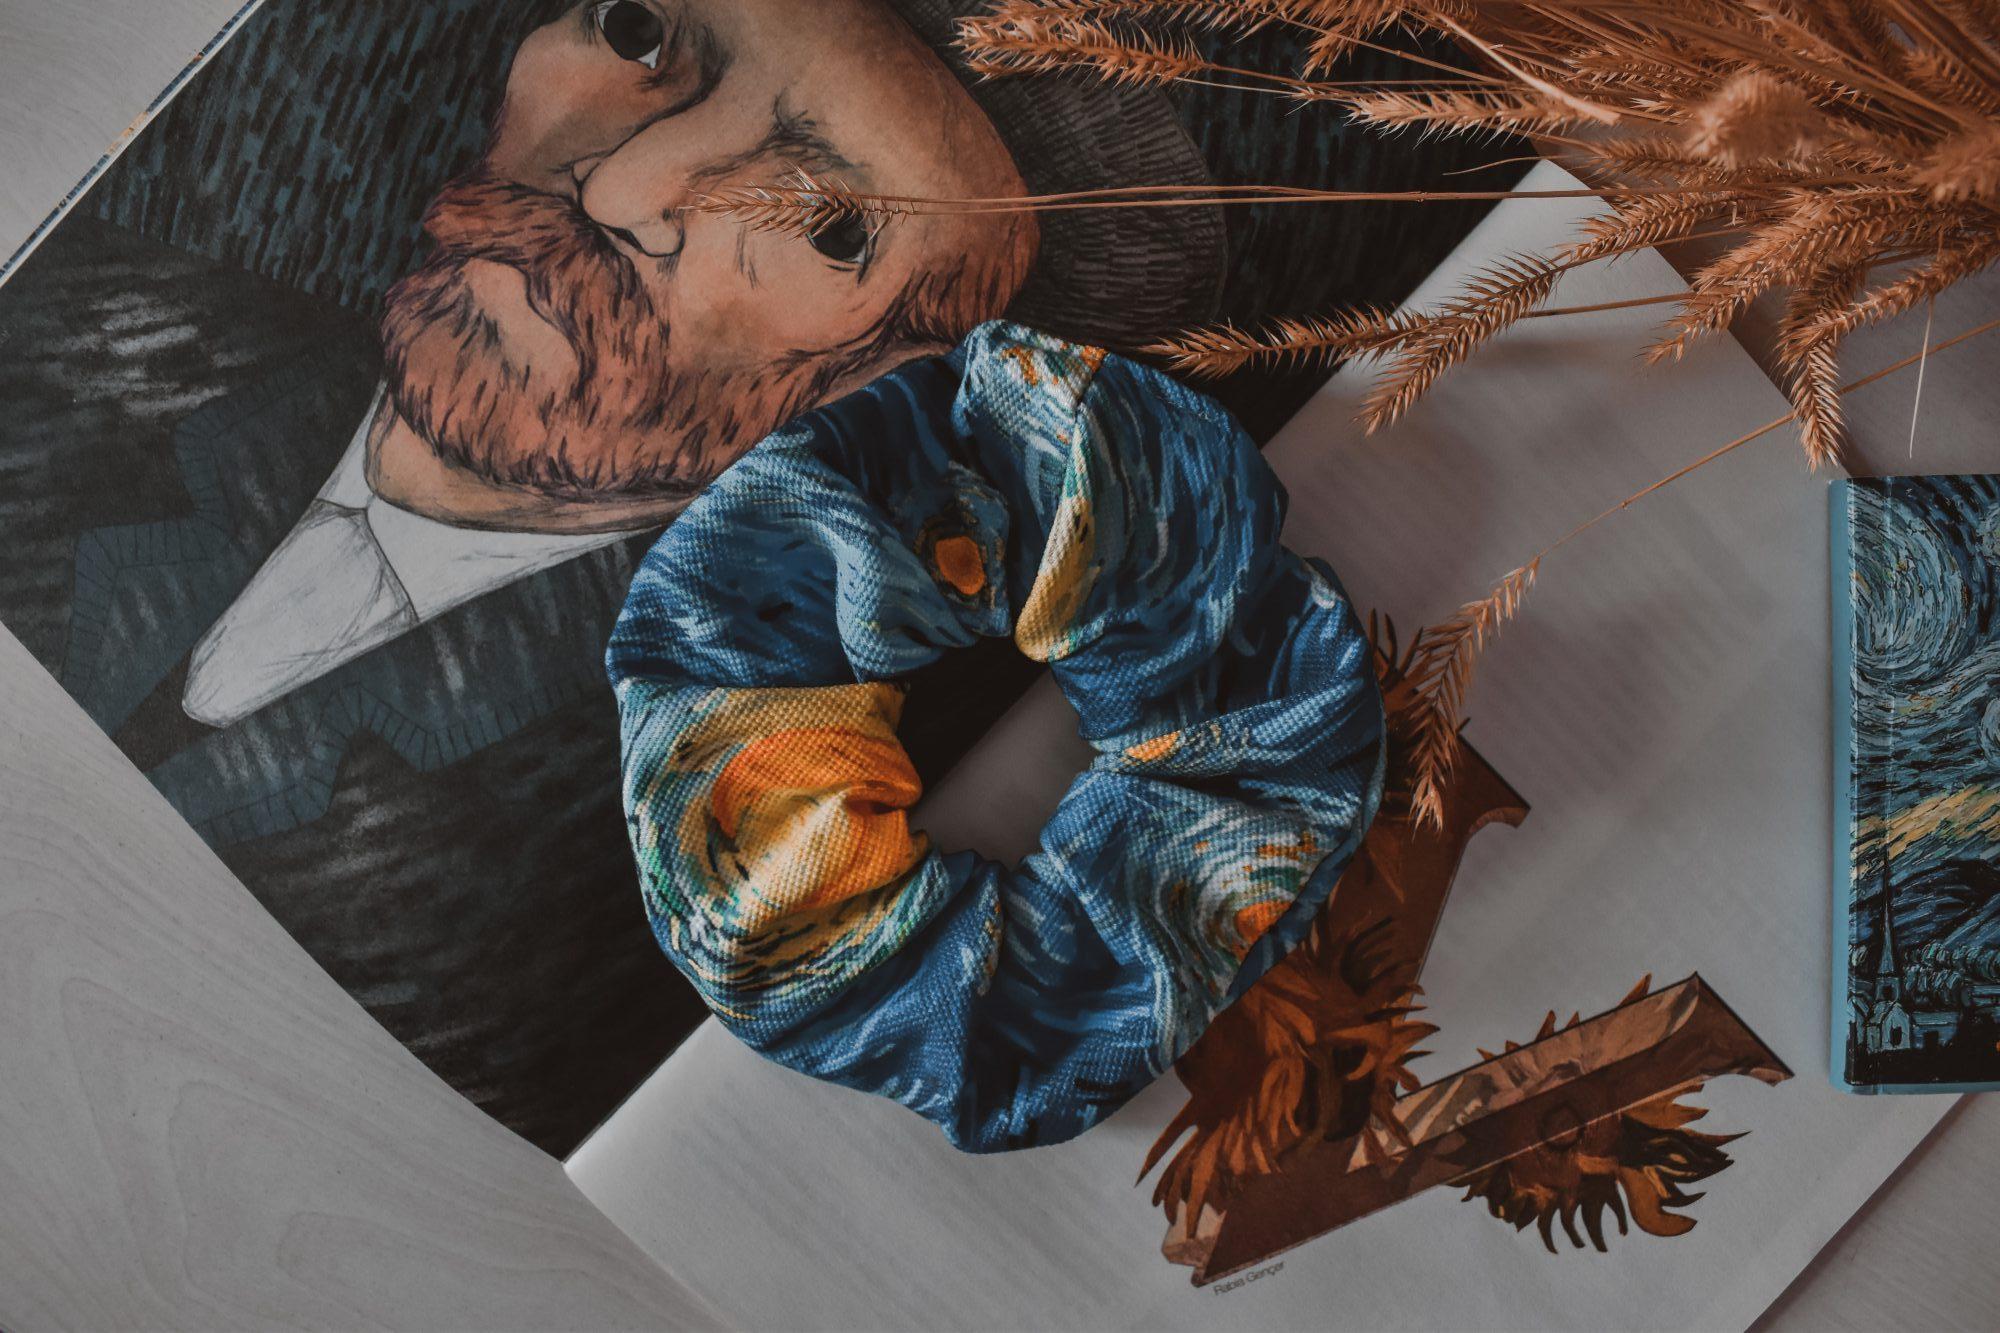 «Inventing Van Gogh»: Μια έκθεση που ζωντανεύει τα έργα του ζωγράφου Ο Ron Dirven, διευθυντής και επιμελητής στο μουσείο Vincent van GoghHuis, στην πόλη Zundert της Ολλανδίας, έχει στόχο να διατηρήσει ζωντανό το πνεύμα του θρυλικού μεταϊμπρεσιονιστή ζωγράφου με το να παραγγέλνει έργα σε σύγχρονους καλλιτέχνες που οραματίζονται εκ νέου τα μοτίβα που είναι το σήμα κατατεθέν του Βαν Γκογκ.